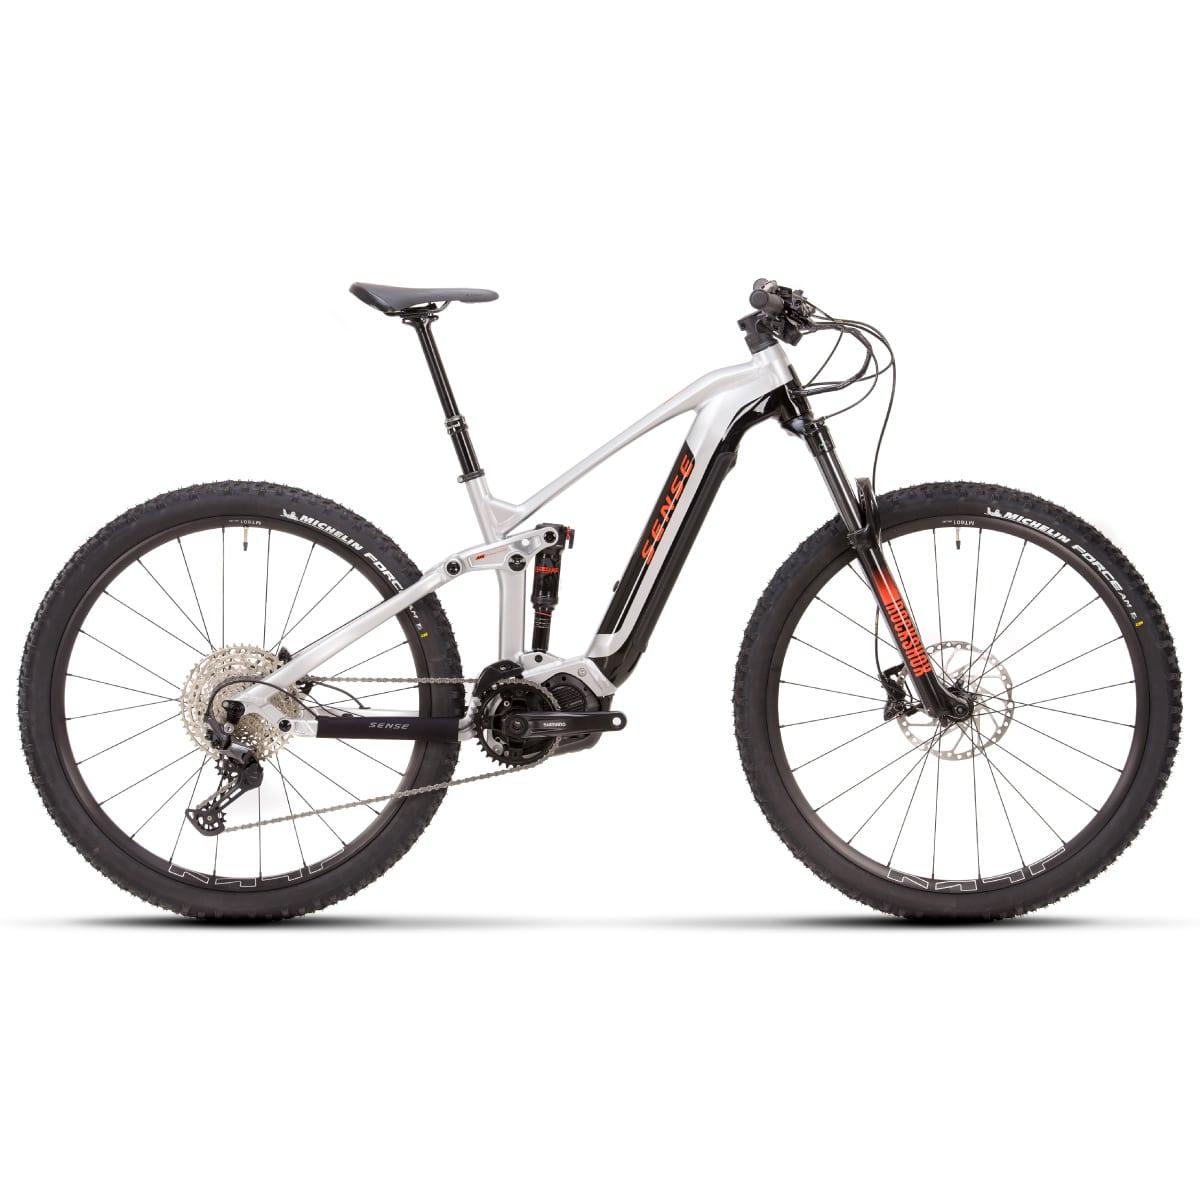 Bike Sense Eletrica Impulse E-Trail Comp 2021 Shimano Deore 12v Aluminio e Laranja